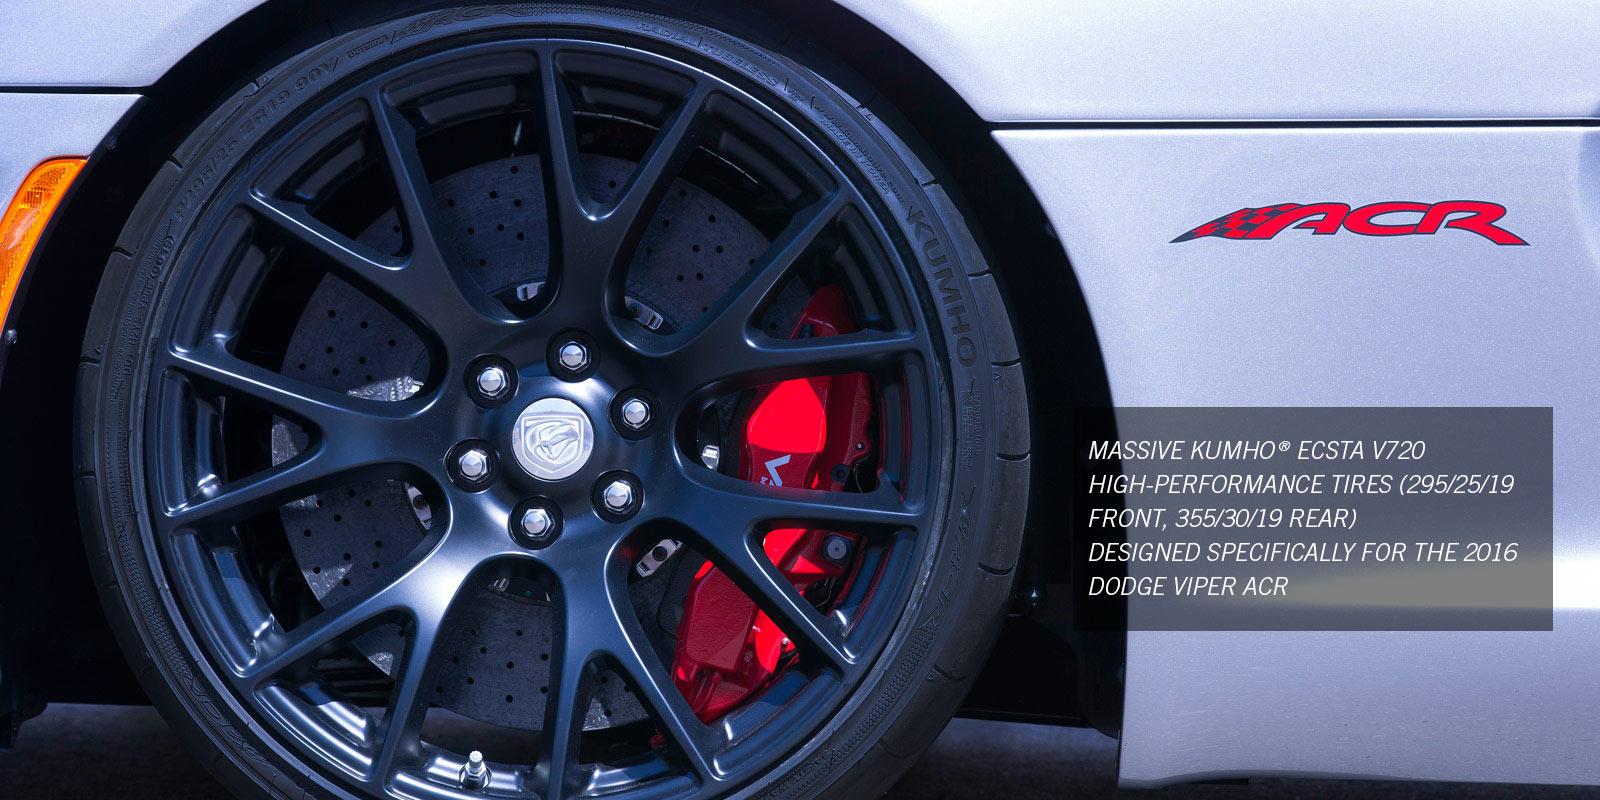 2016 Dodge Viper ACR - Kumho